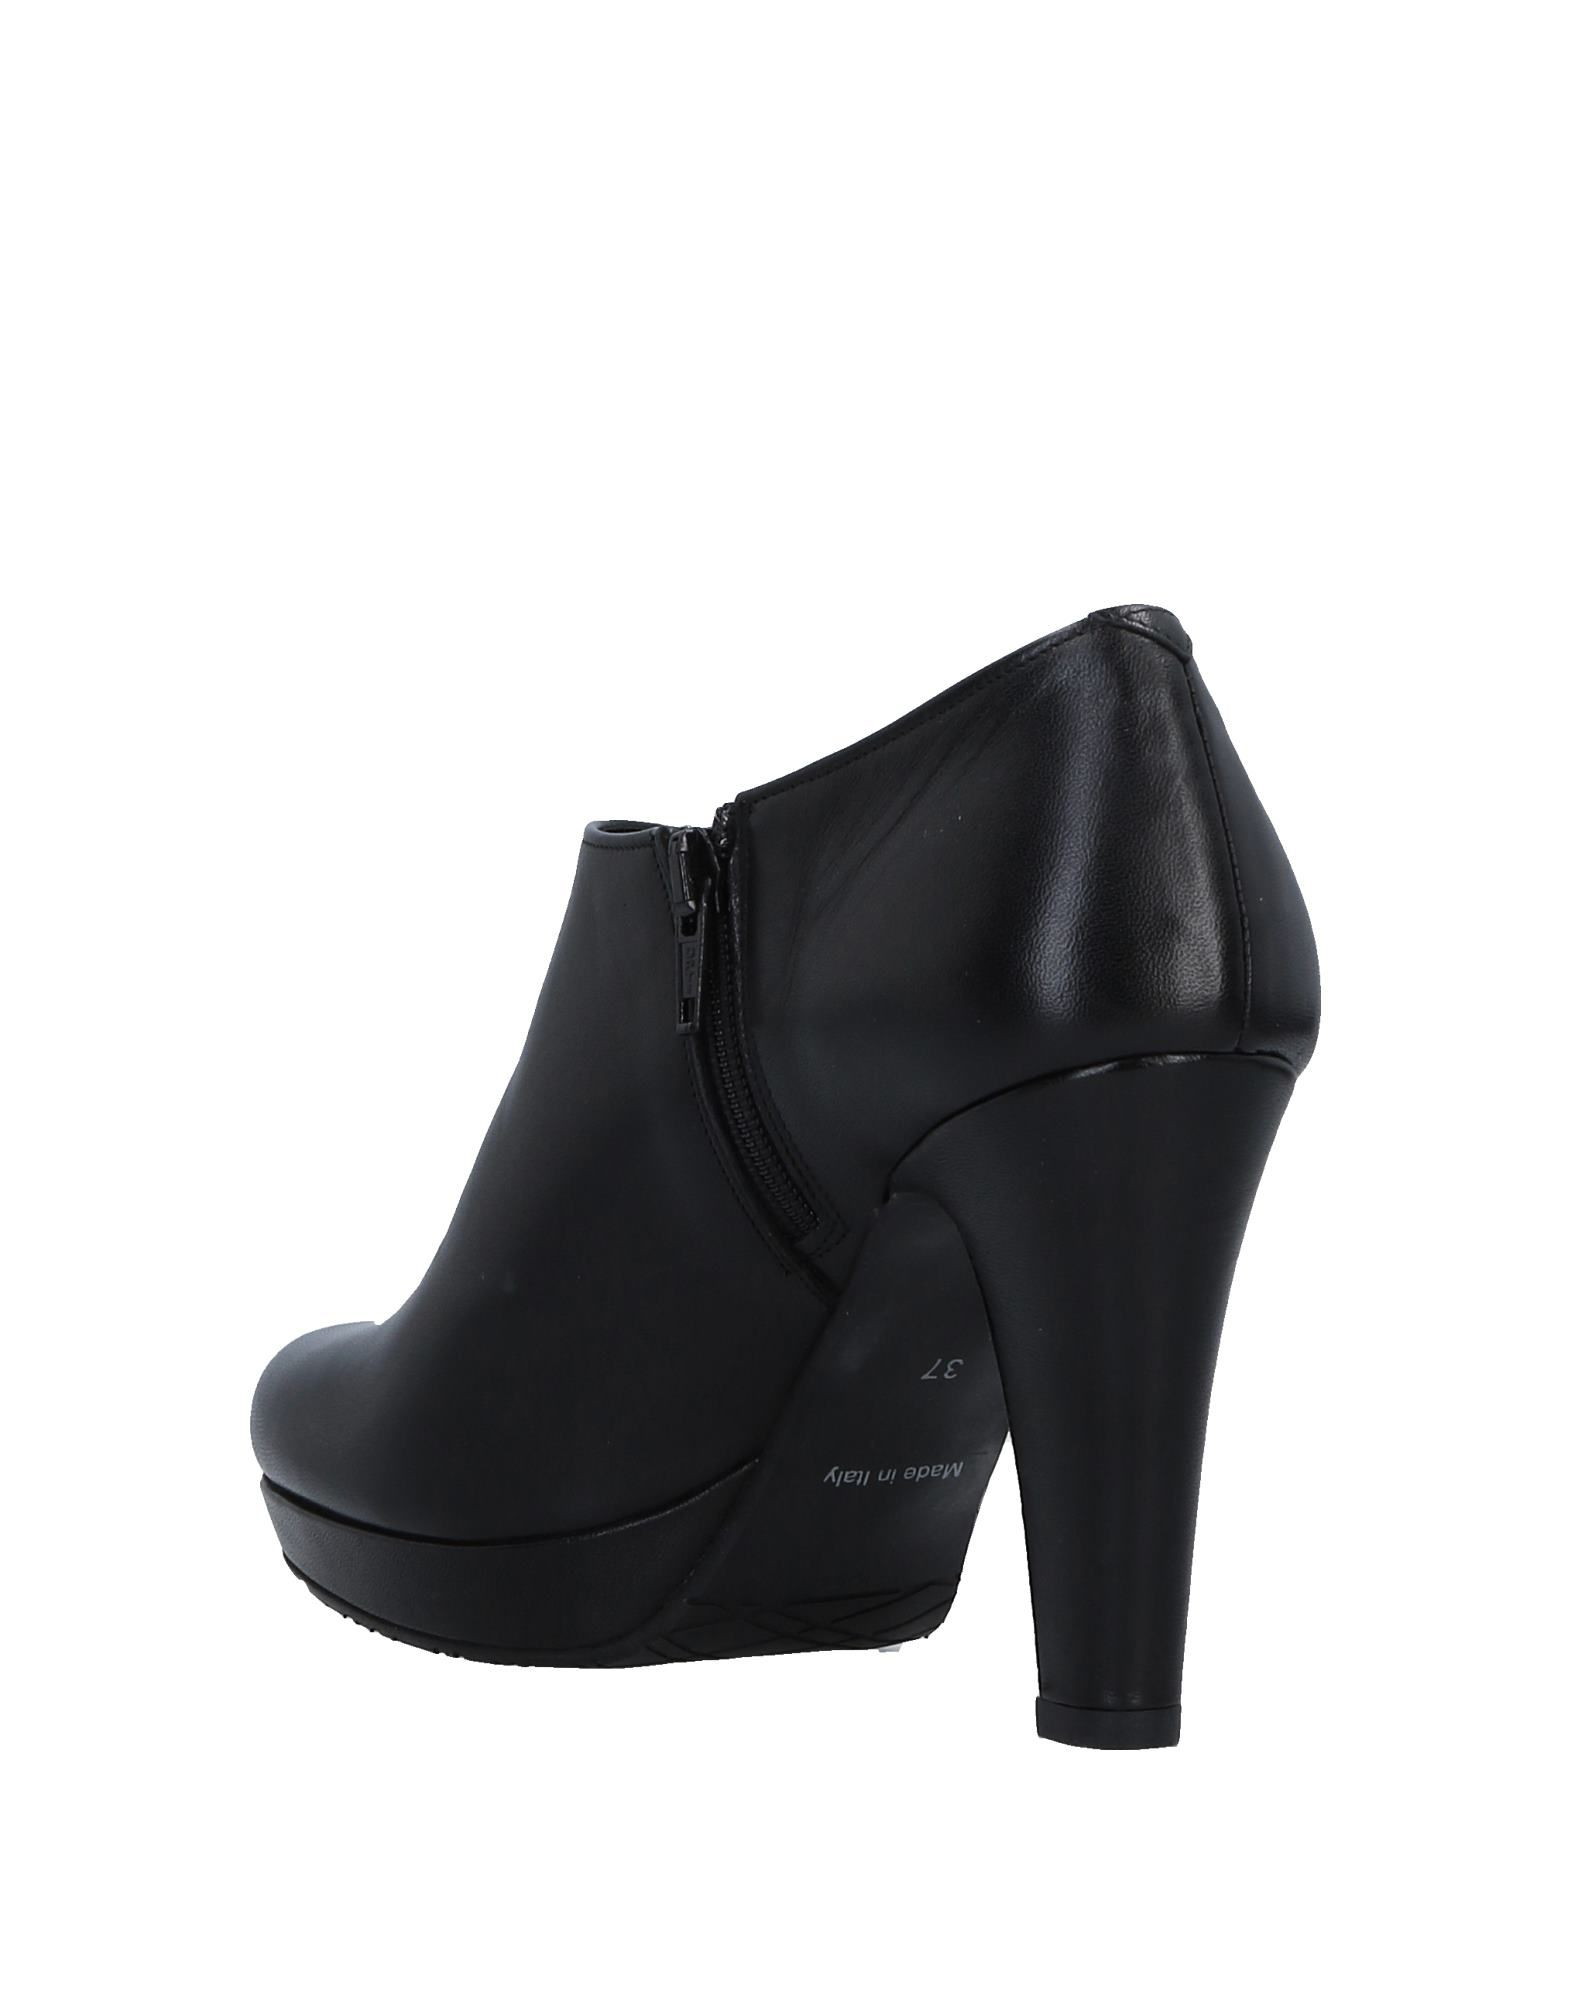 Jada Simon Ankle Boot - Women Jada Simon  Ankle Boots online on  Simon United Kingdom - 11533206OW dc8297